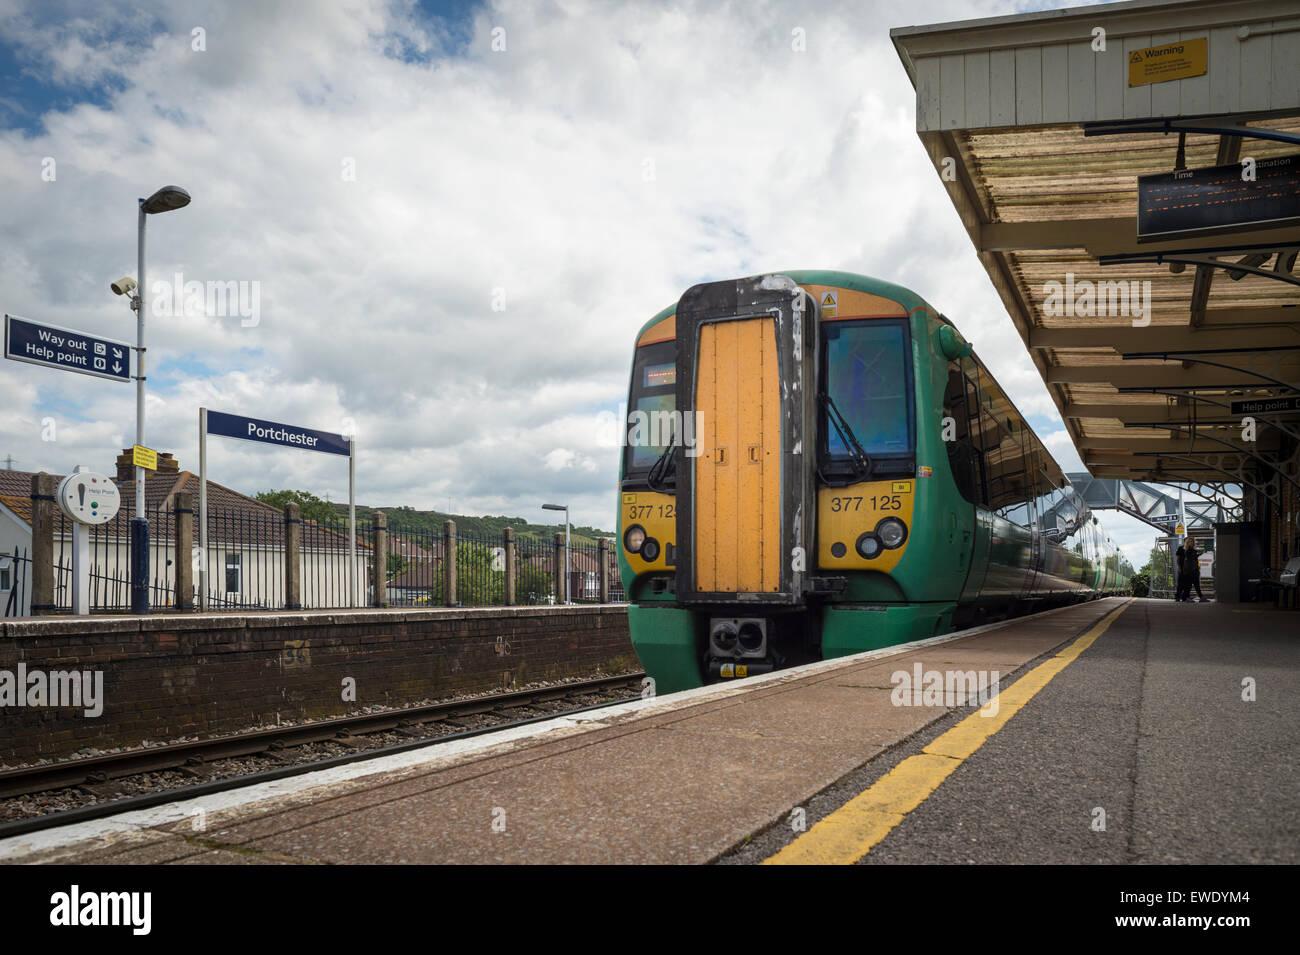 Train arriving at the platform at Portchester station - Stock Image